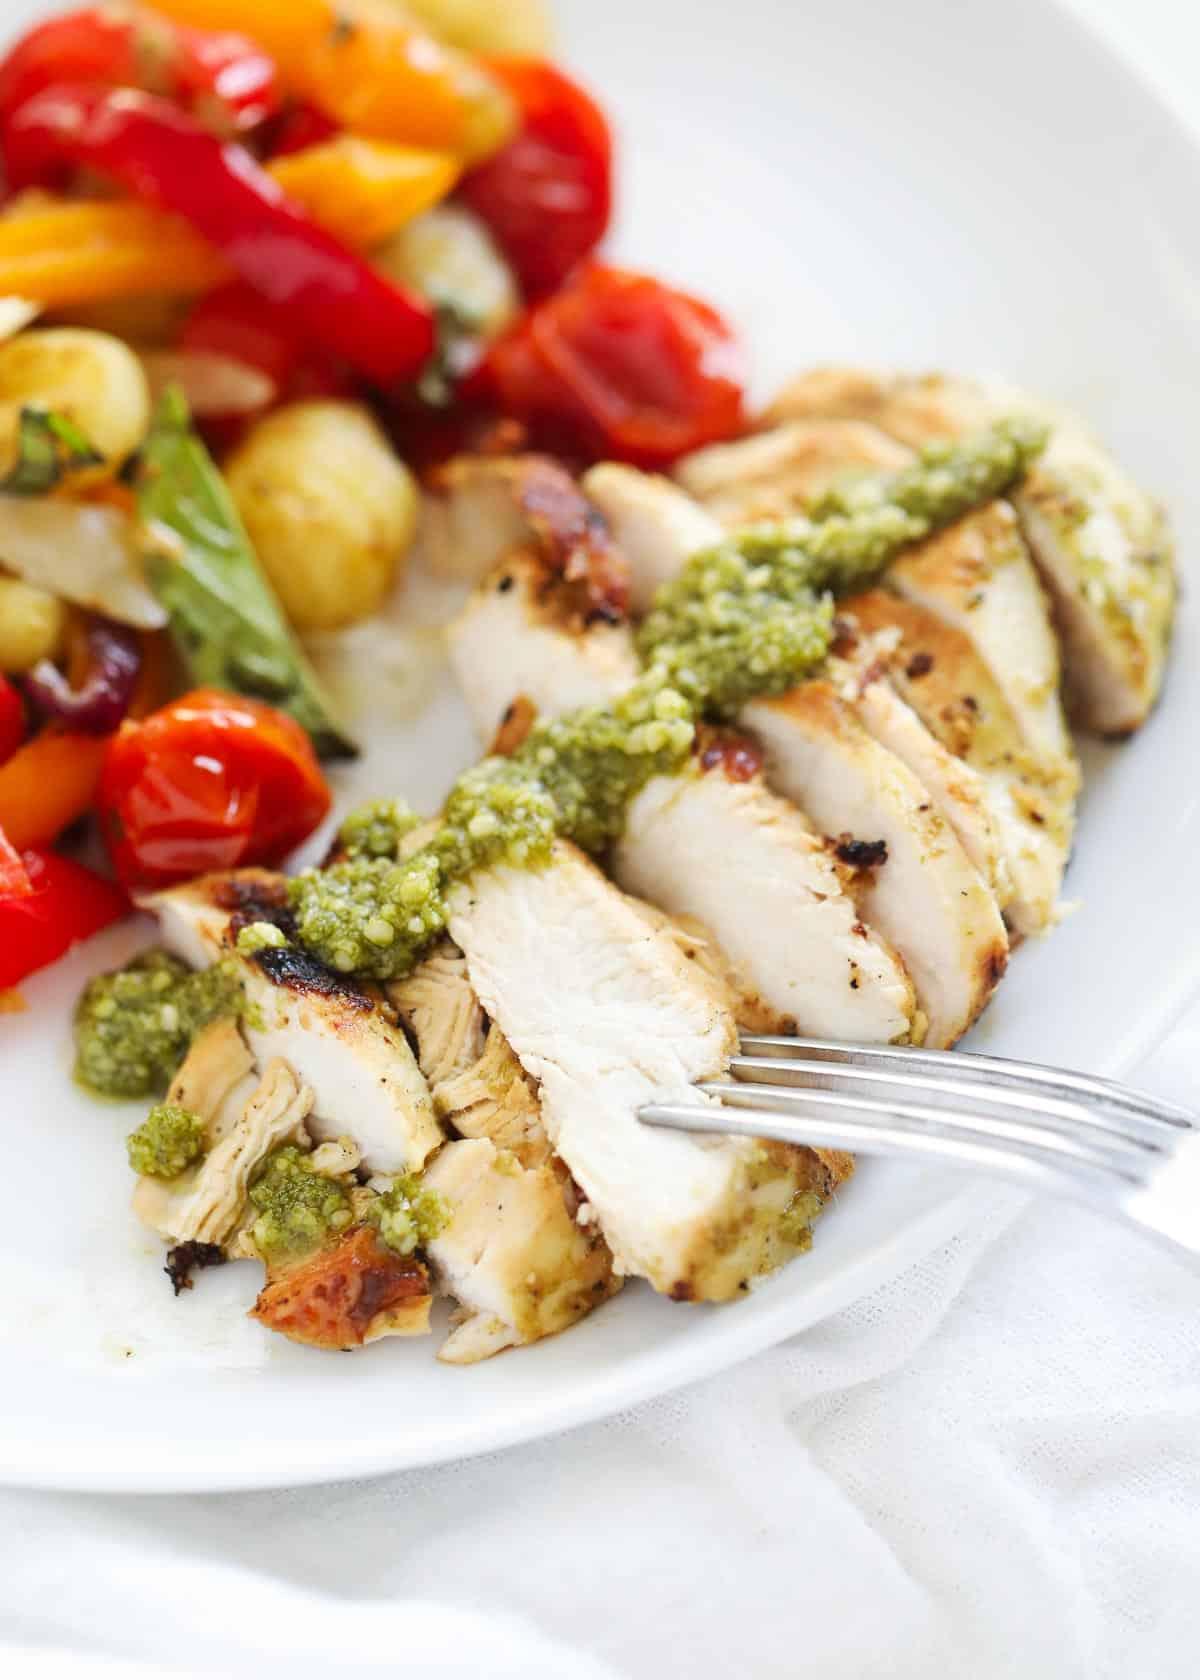 sliced pesto chicken on plate